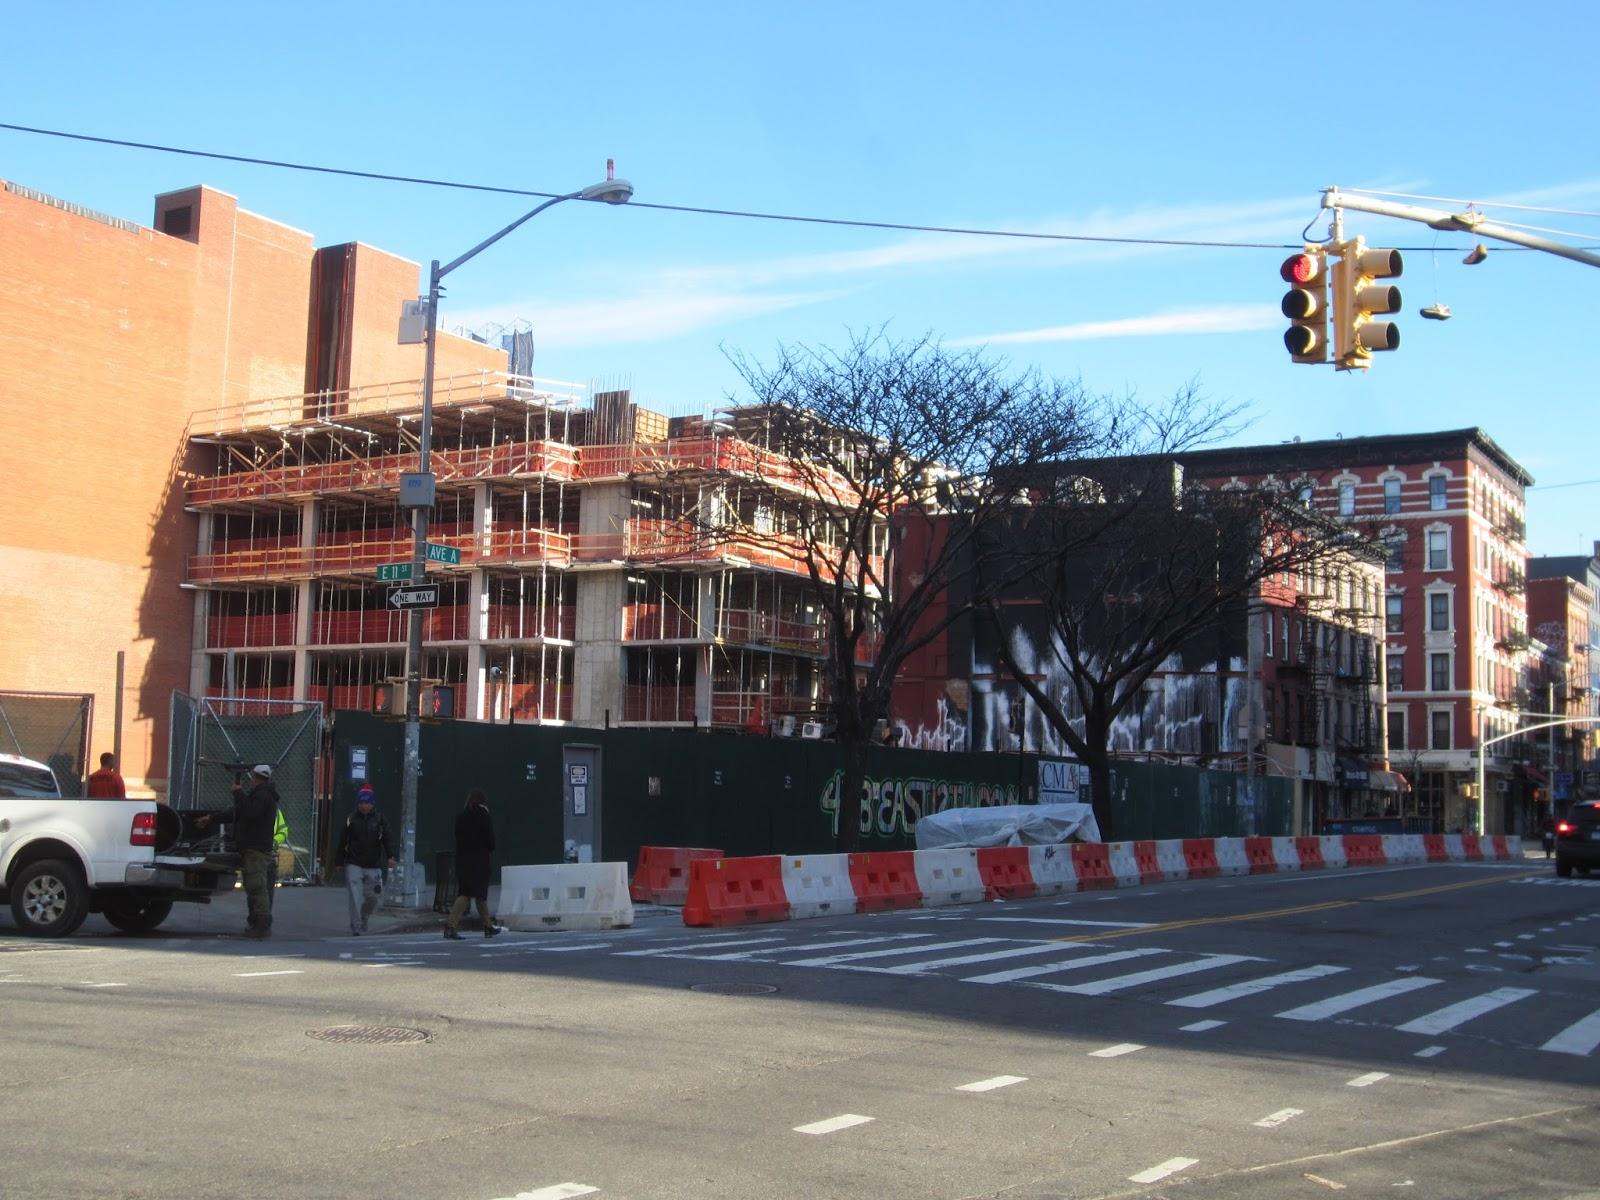 438 East 12th Street